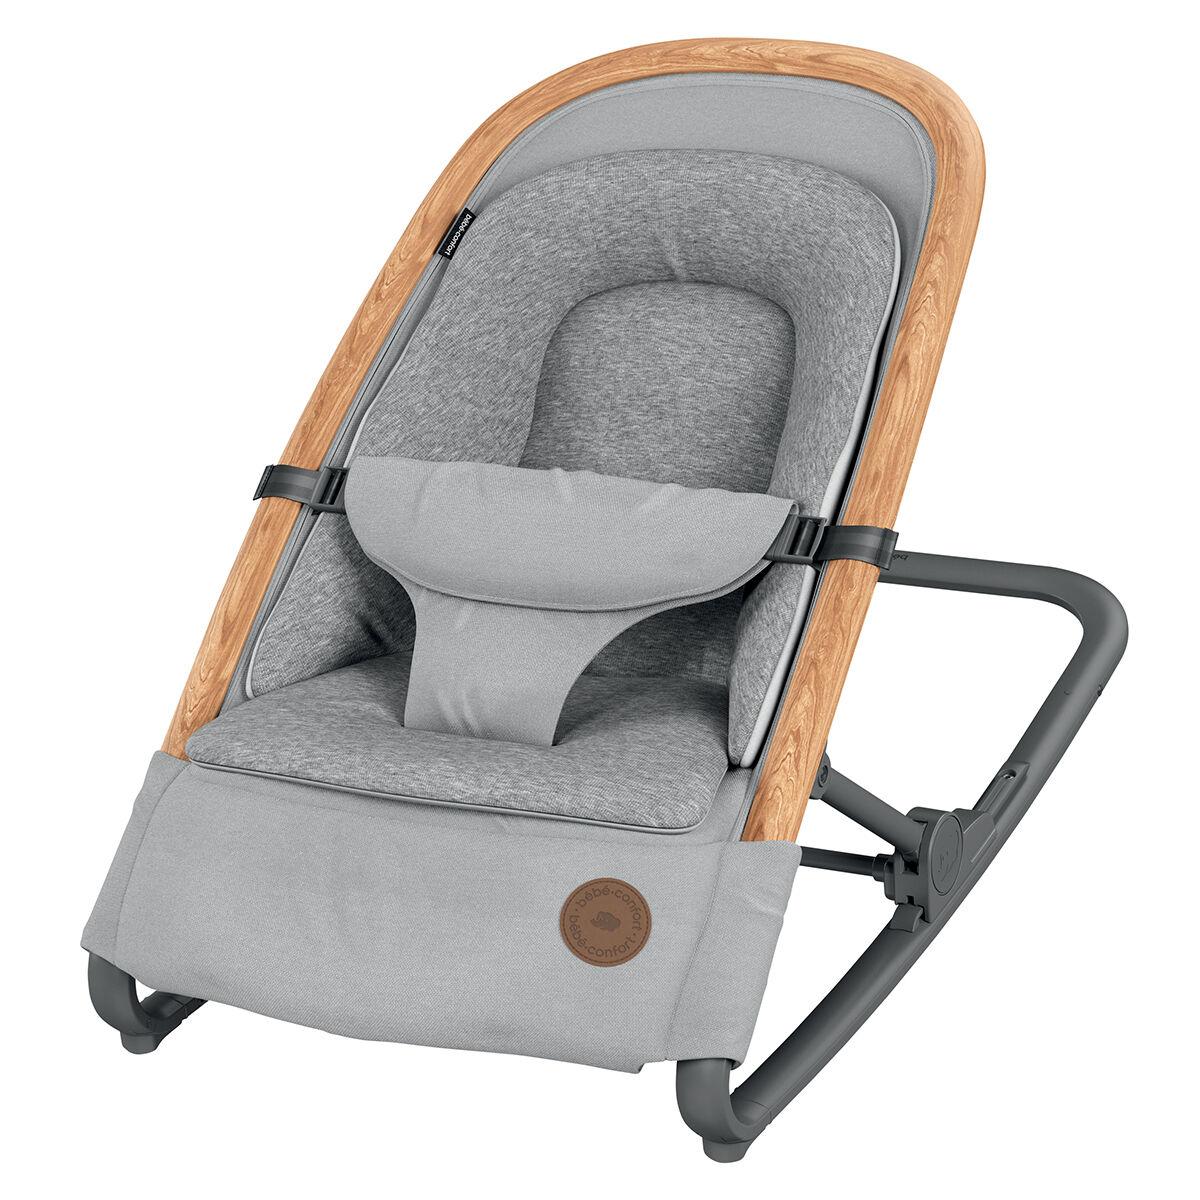 Bébé Confort Transat Kori - Essential Grey